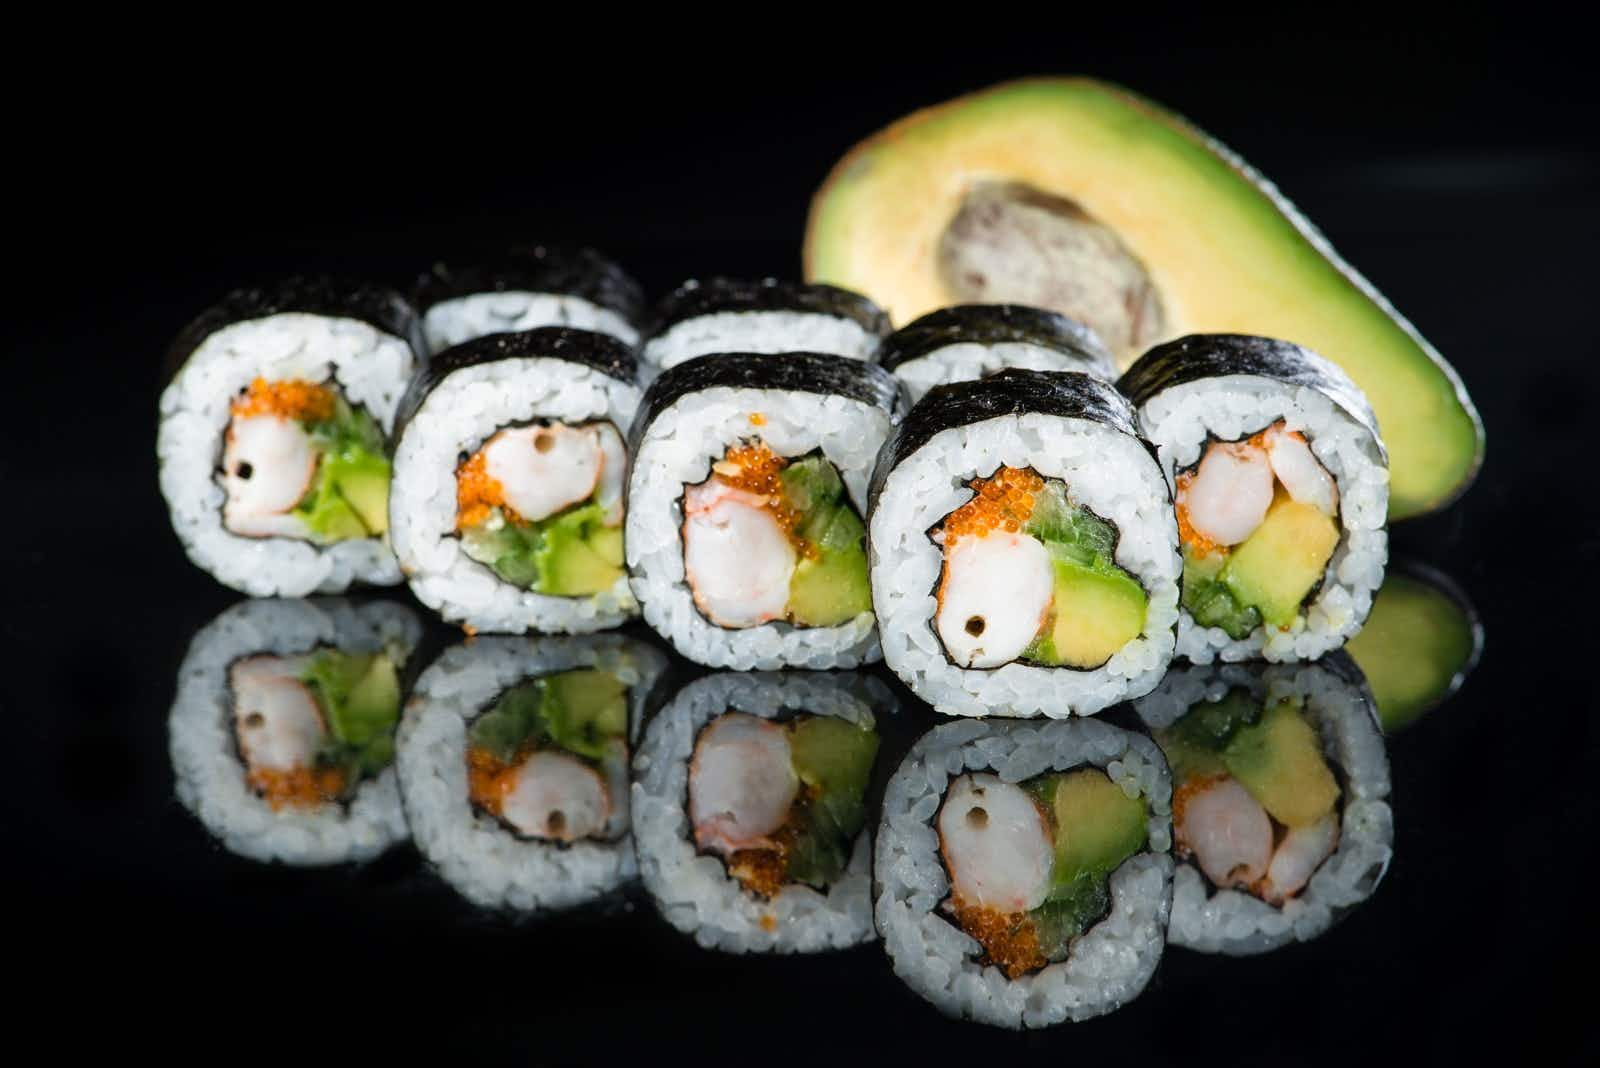 Fresh delicious Japanese sushi with avocado, cucumber, shrimp and caviar on dark background